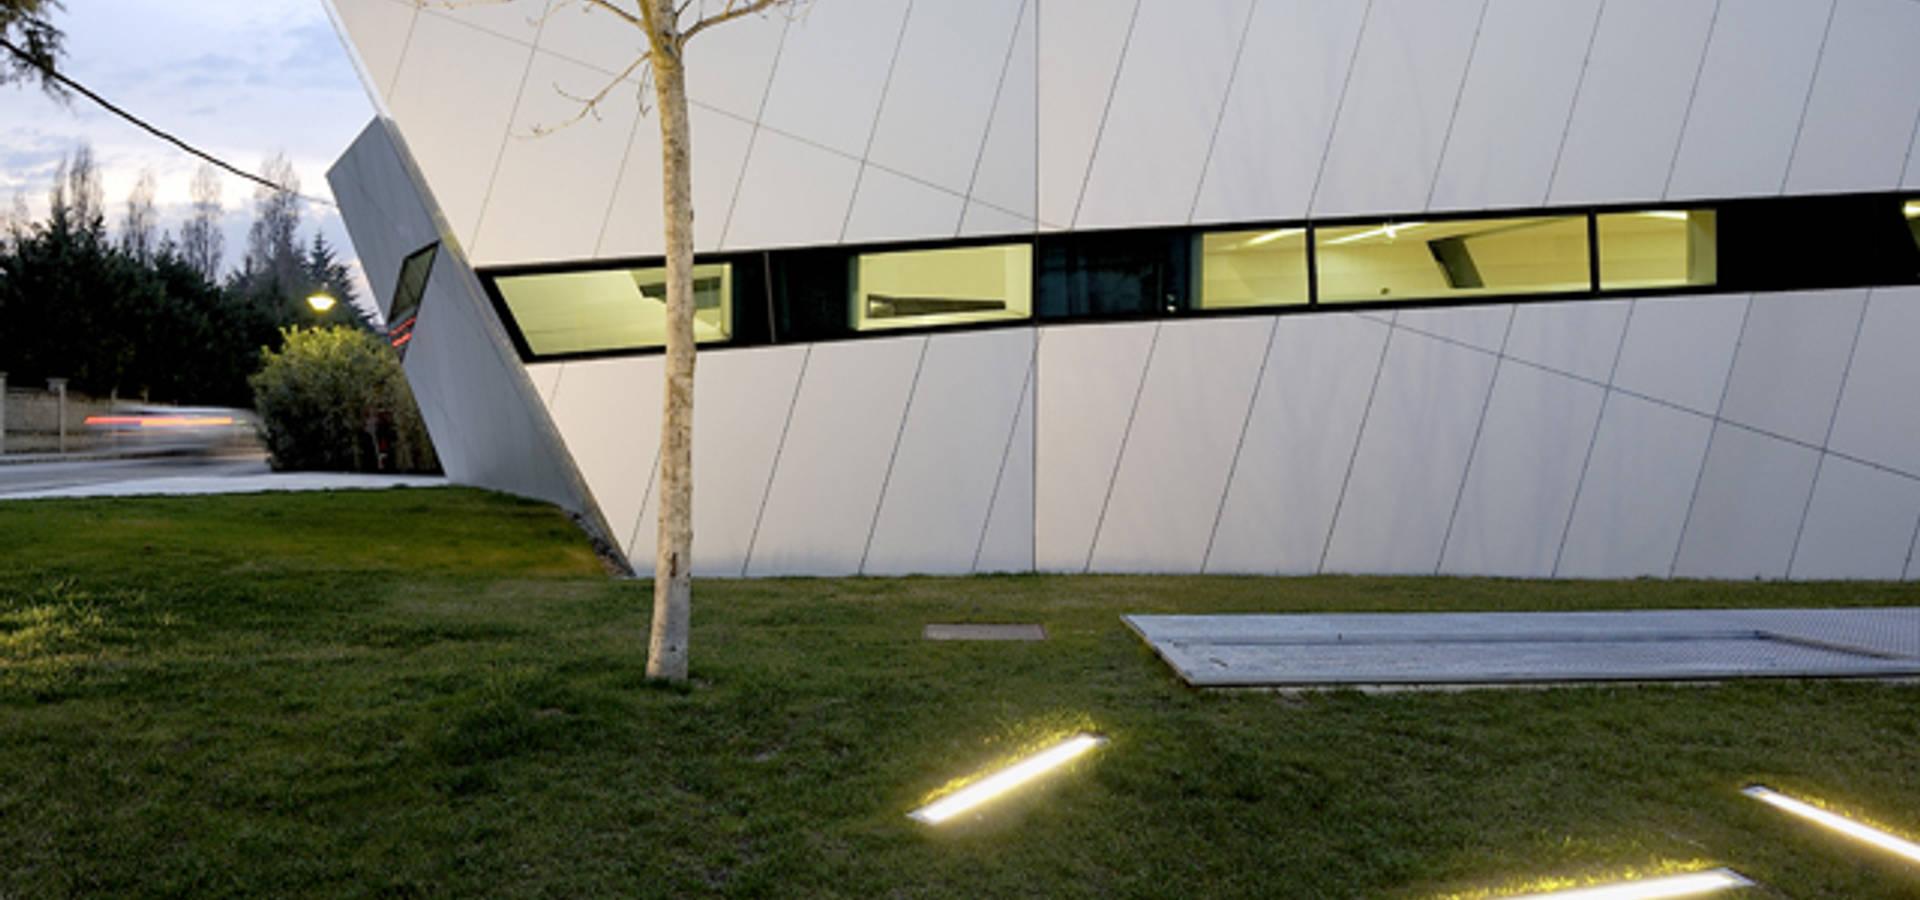 Studio Terragni